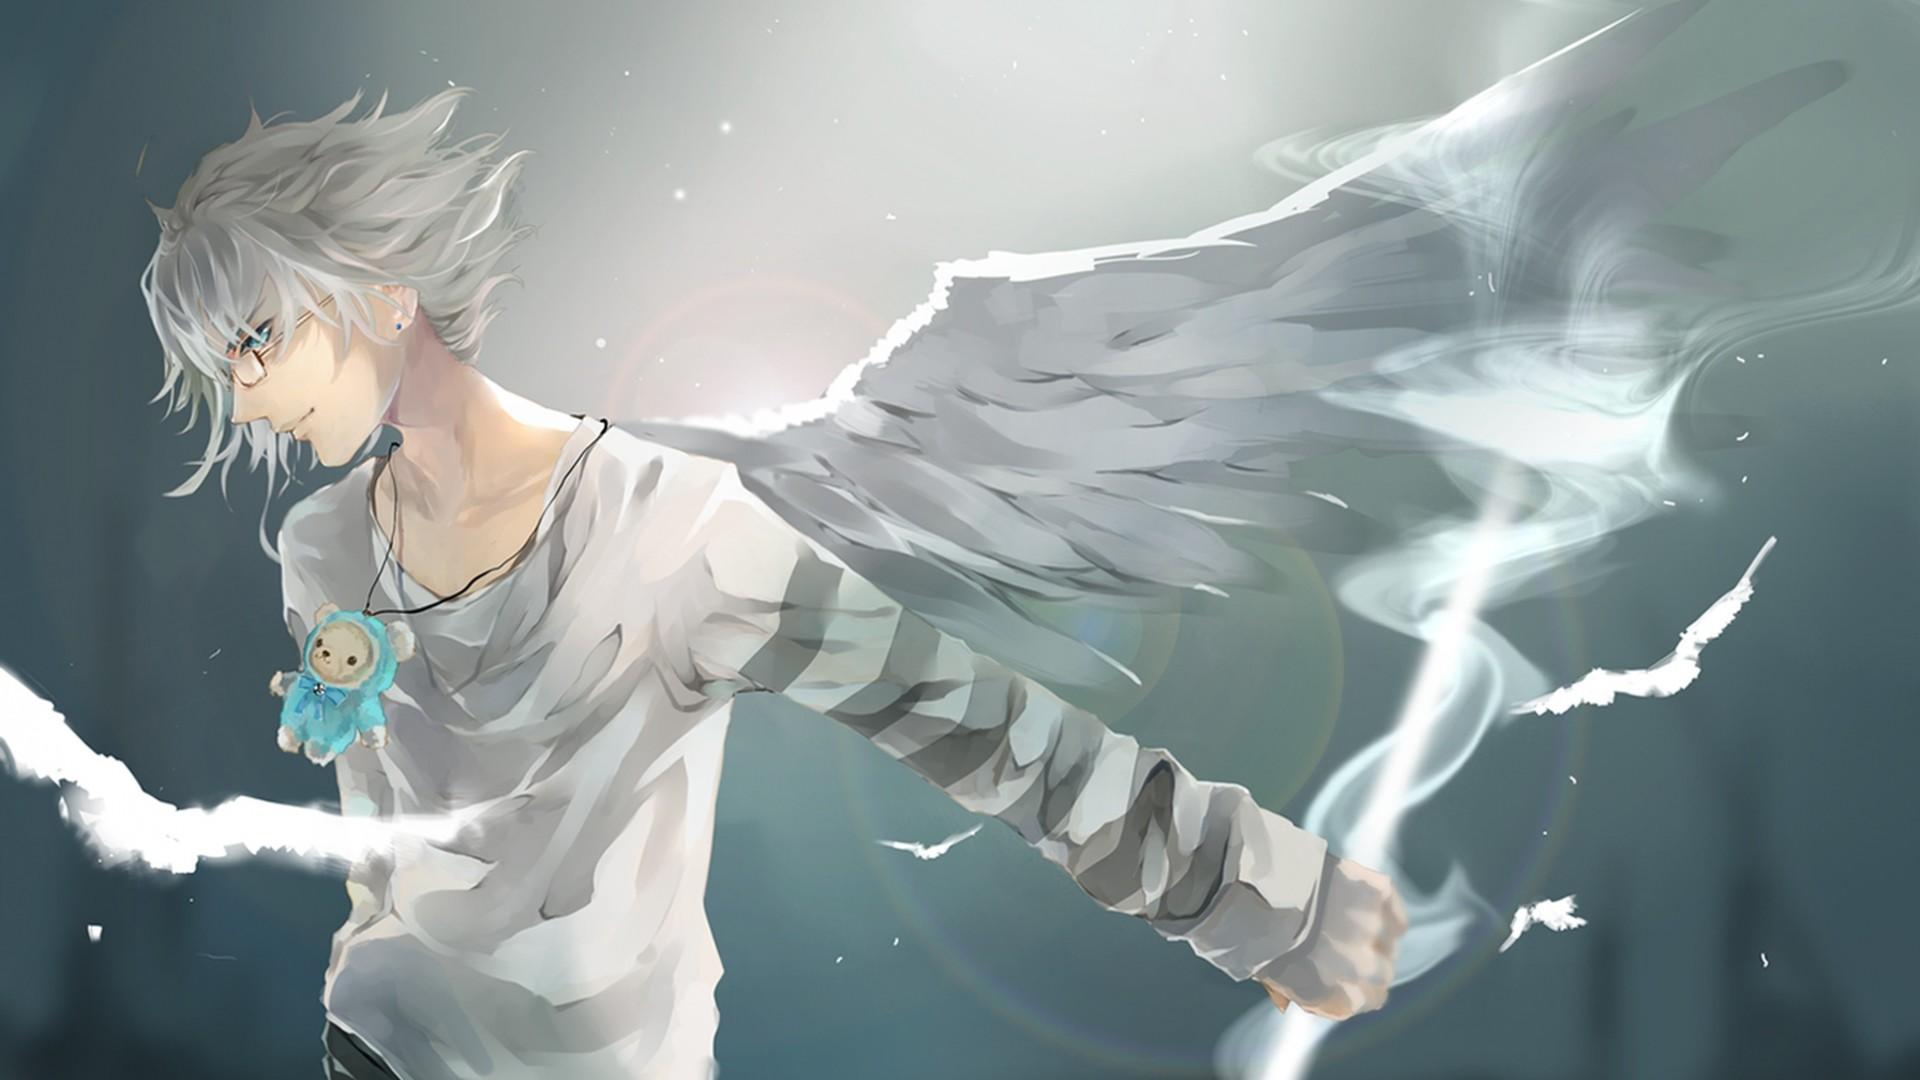 Download Wallpaper Anime, Boy, Wings, Art Full HD 1080p HD  Background